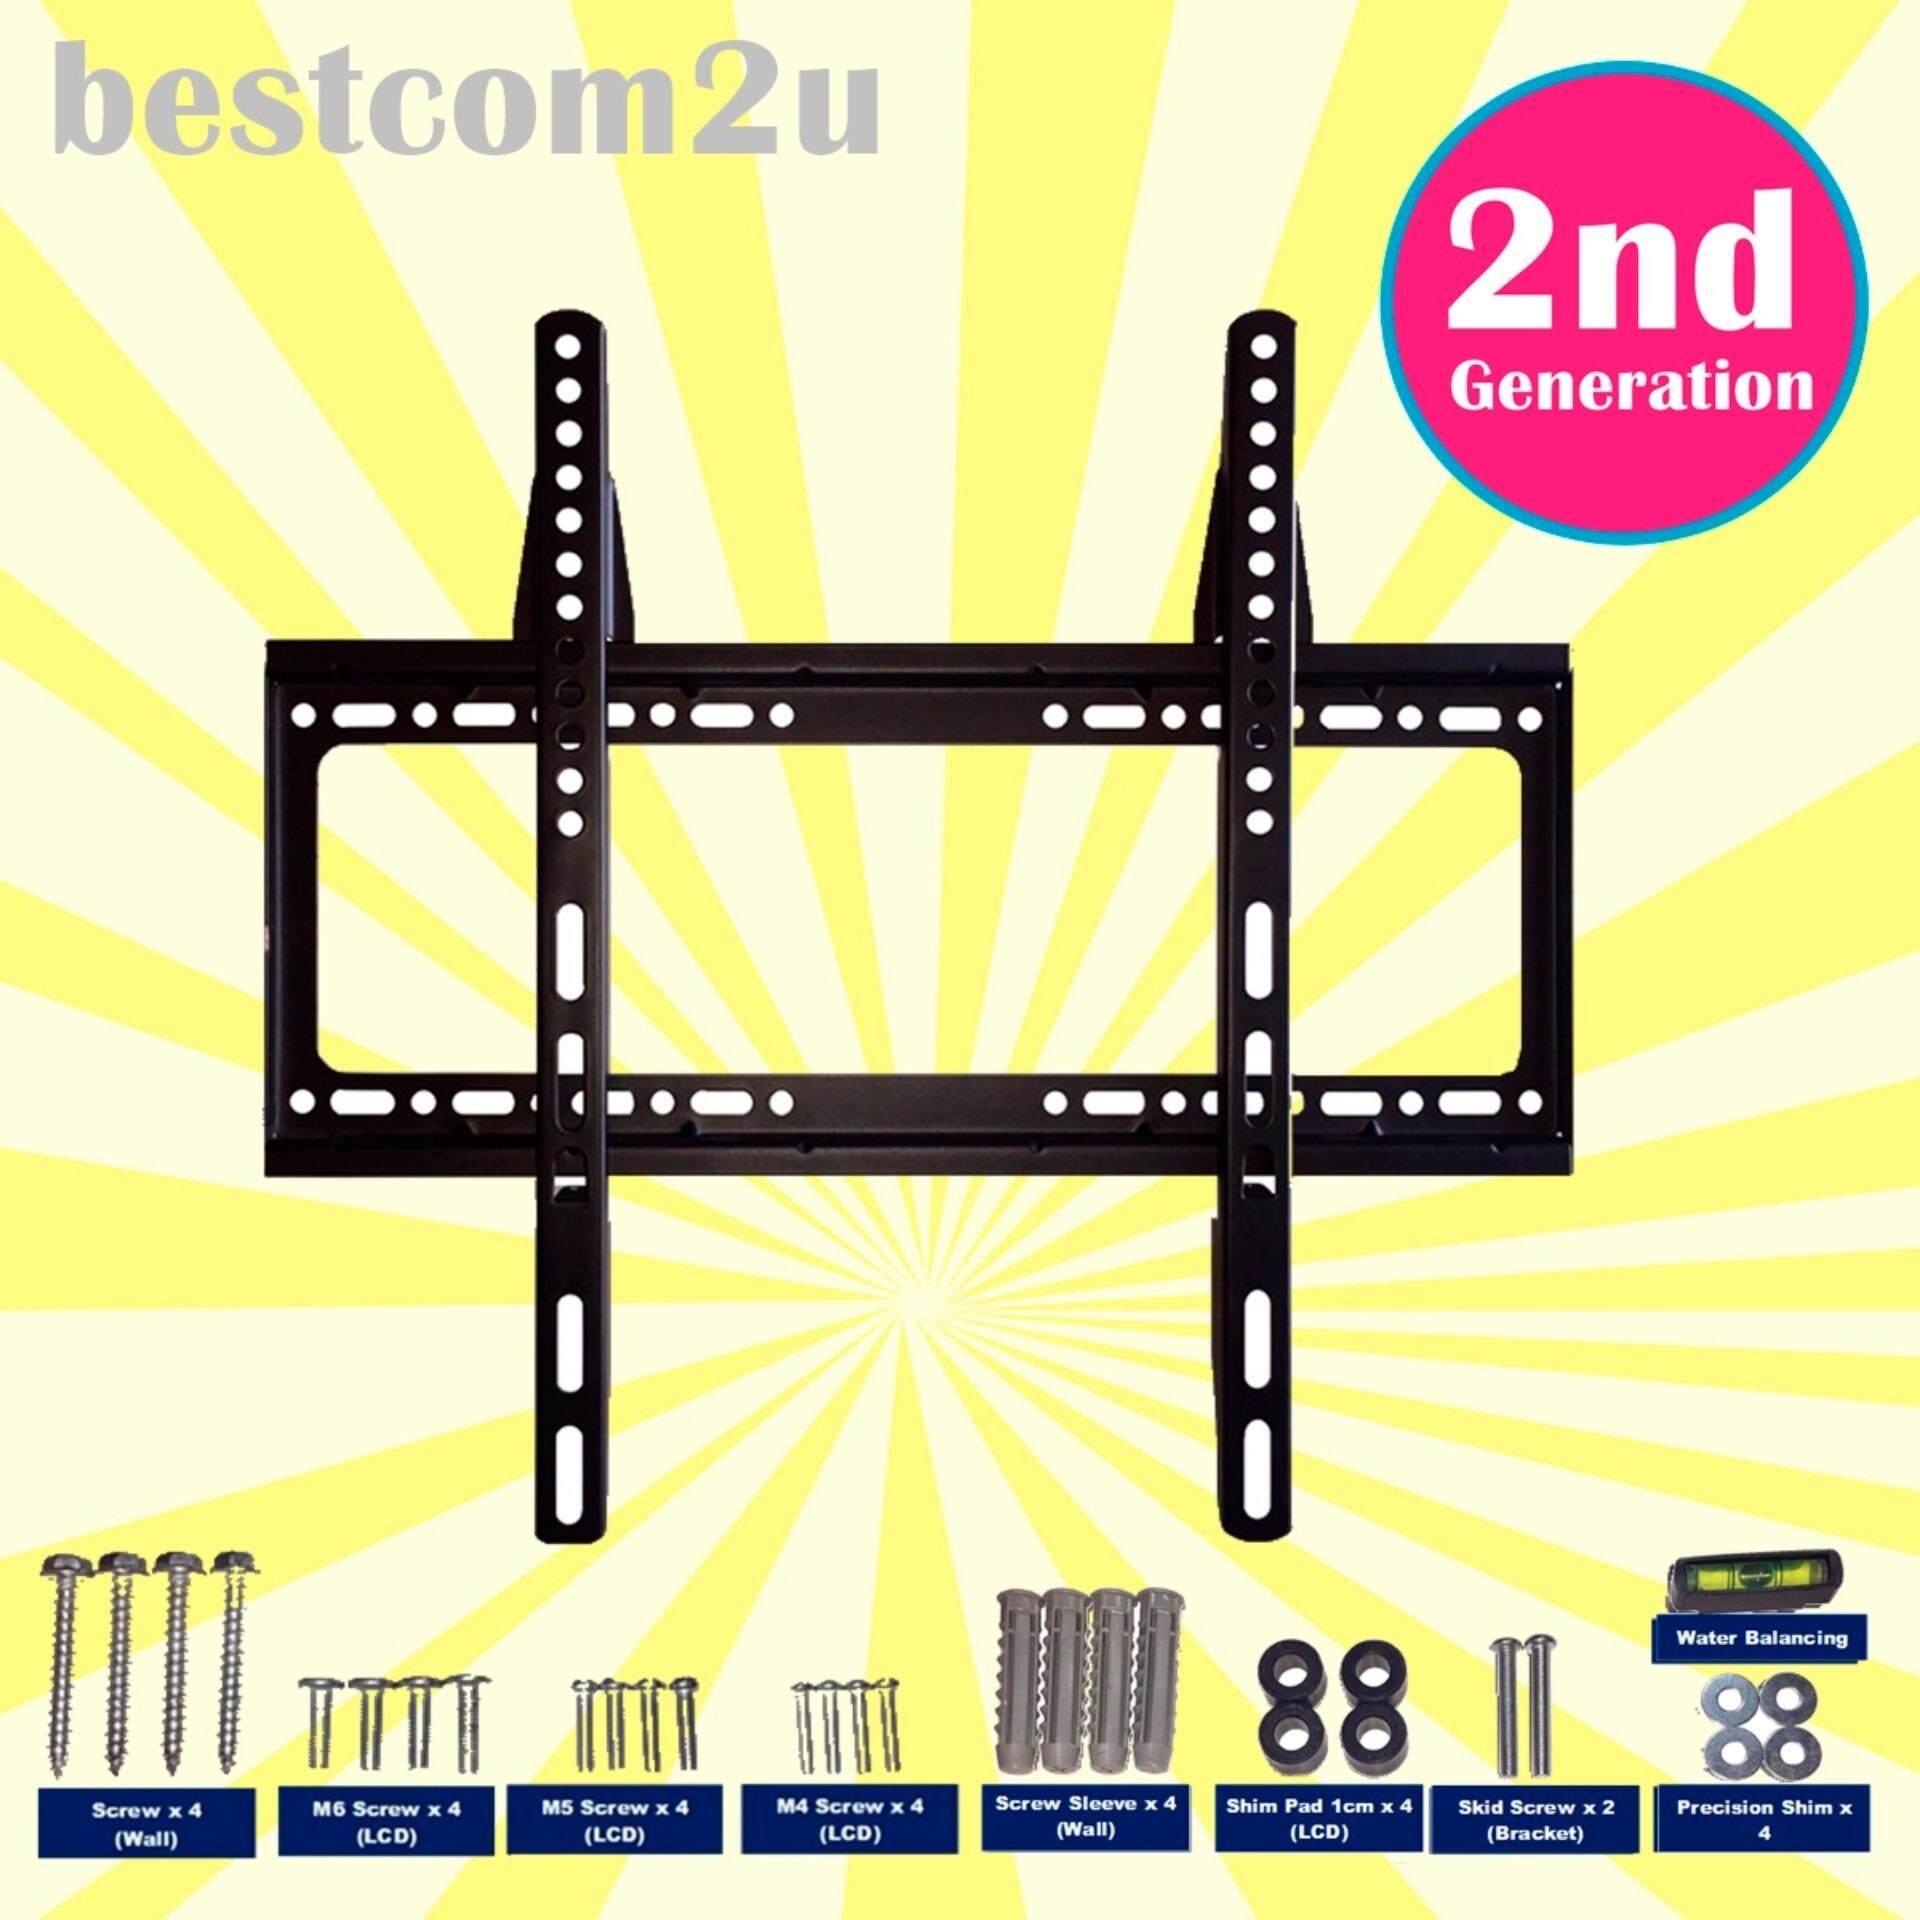 Full Set Screw Universal 26 - 63 Inch TV Bracket Wall Mount LCD LED -  BESTCOM2U